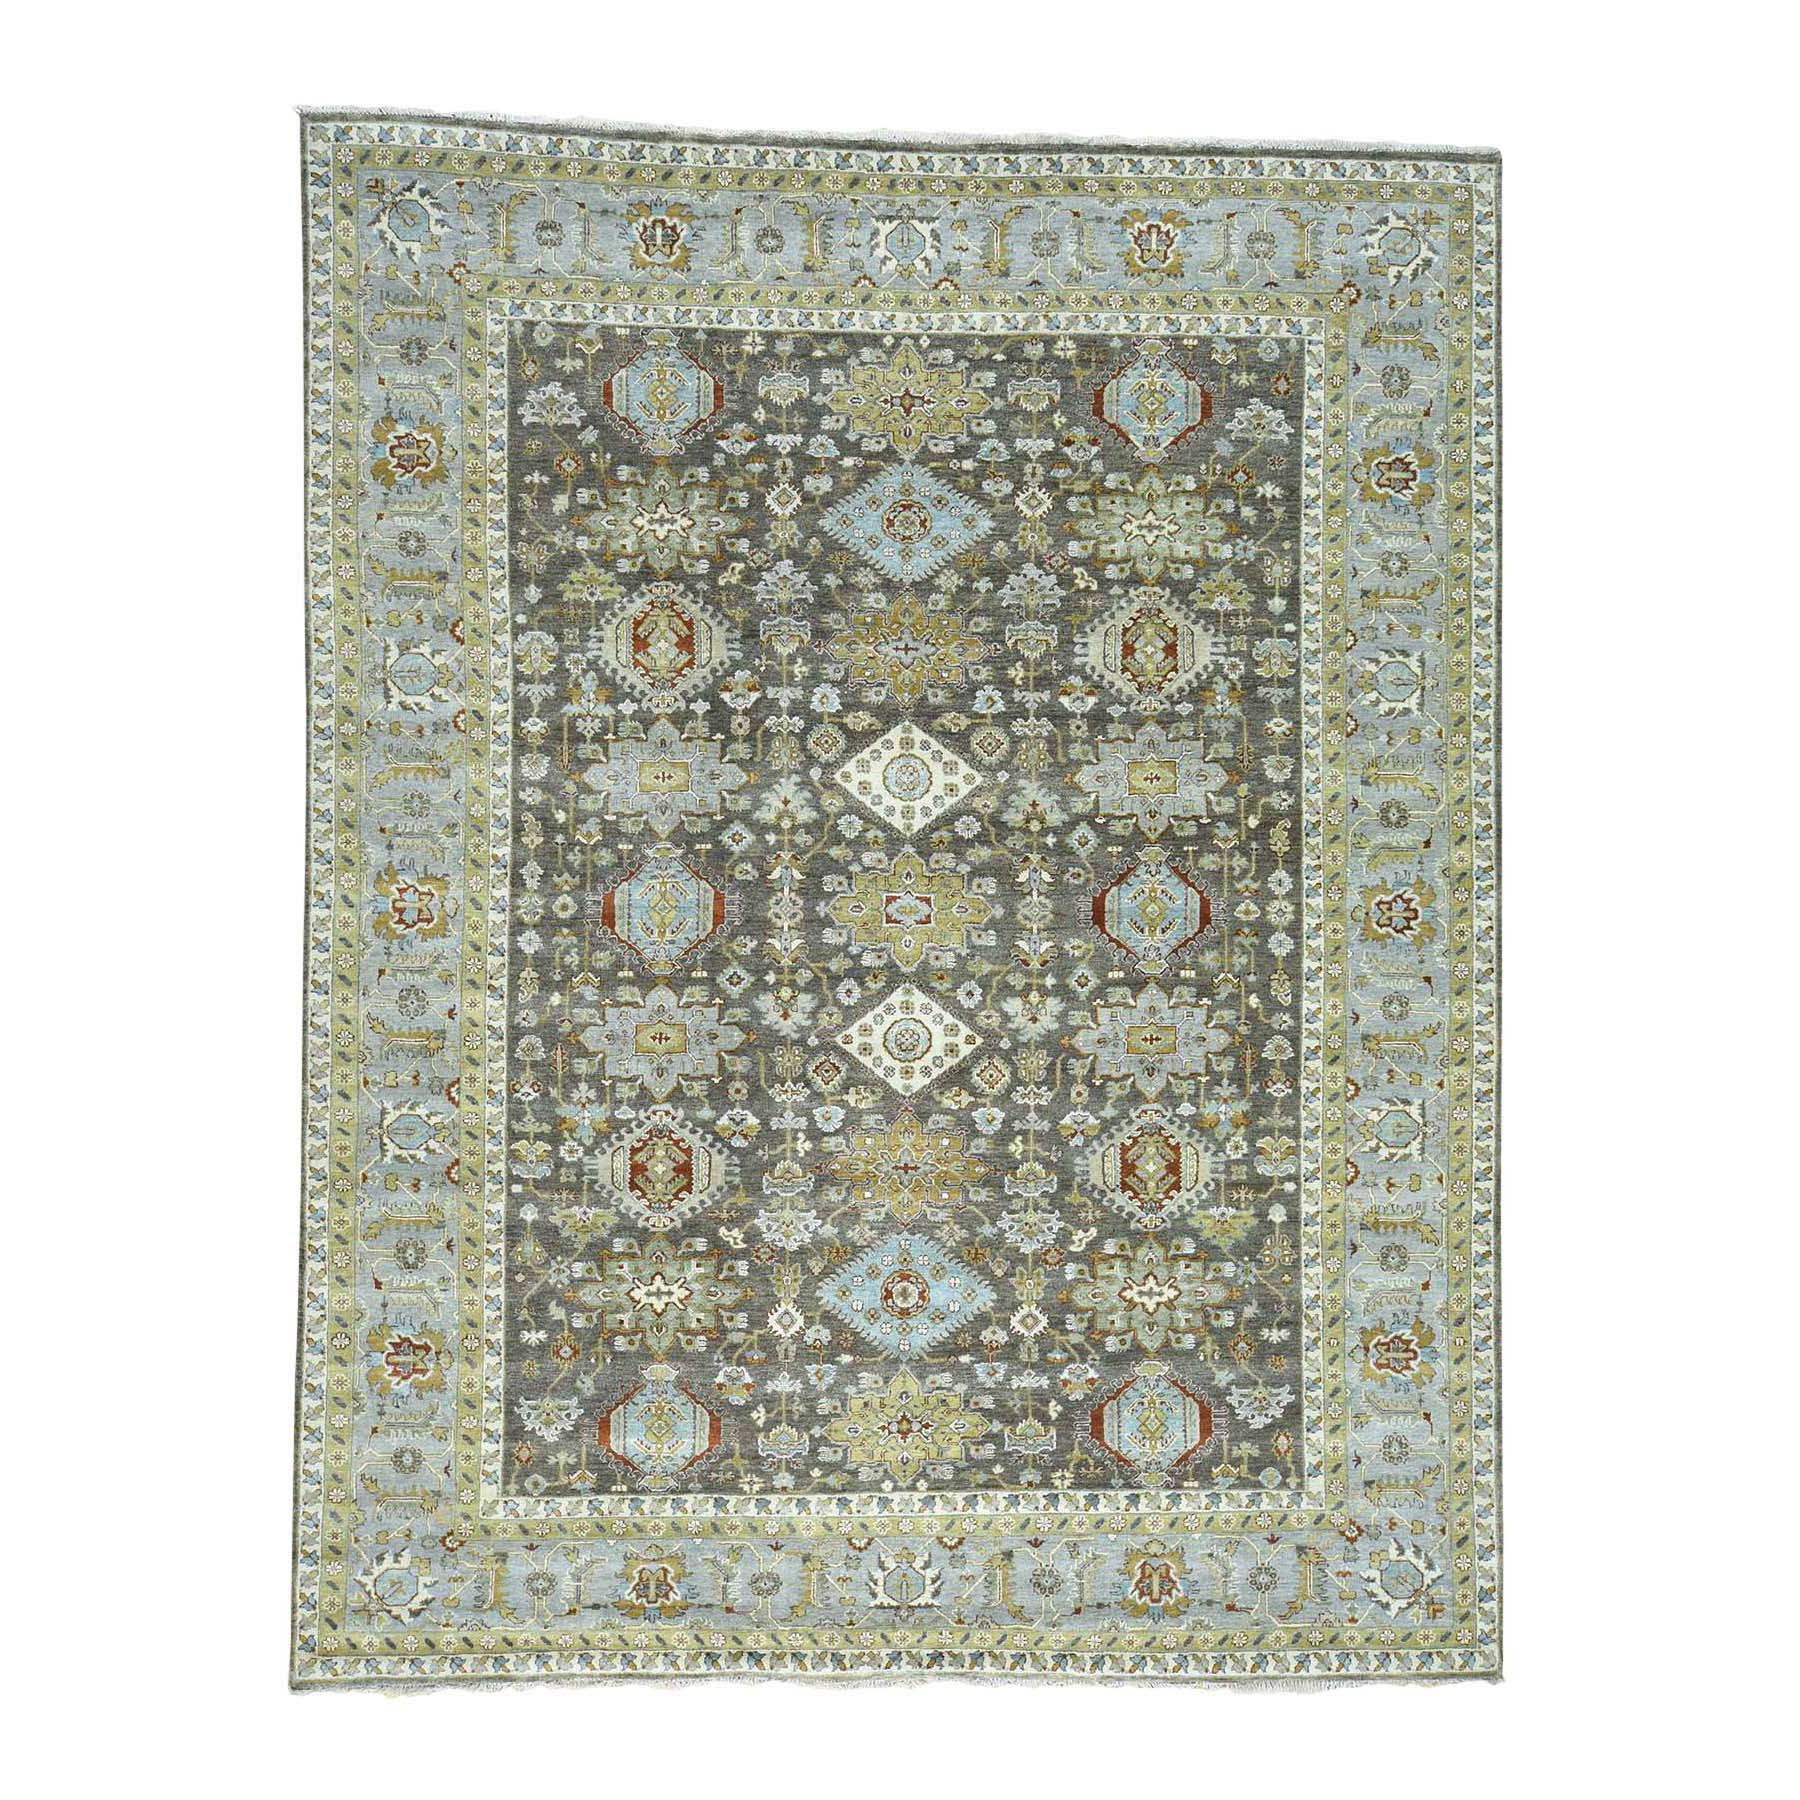 "10'X13'9"" Hand-Knotted Pure Wool Karajeh Design Oriental Rug moac6ed9"